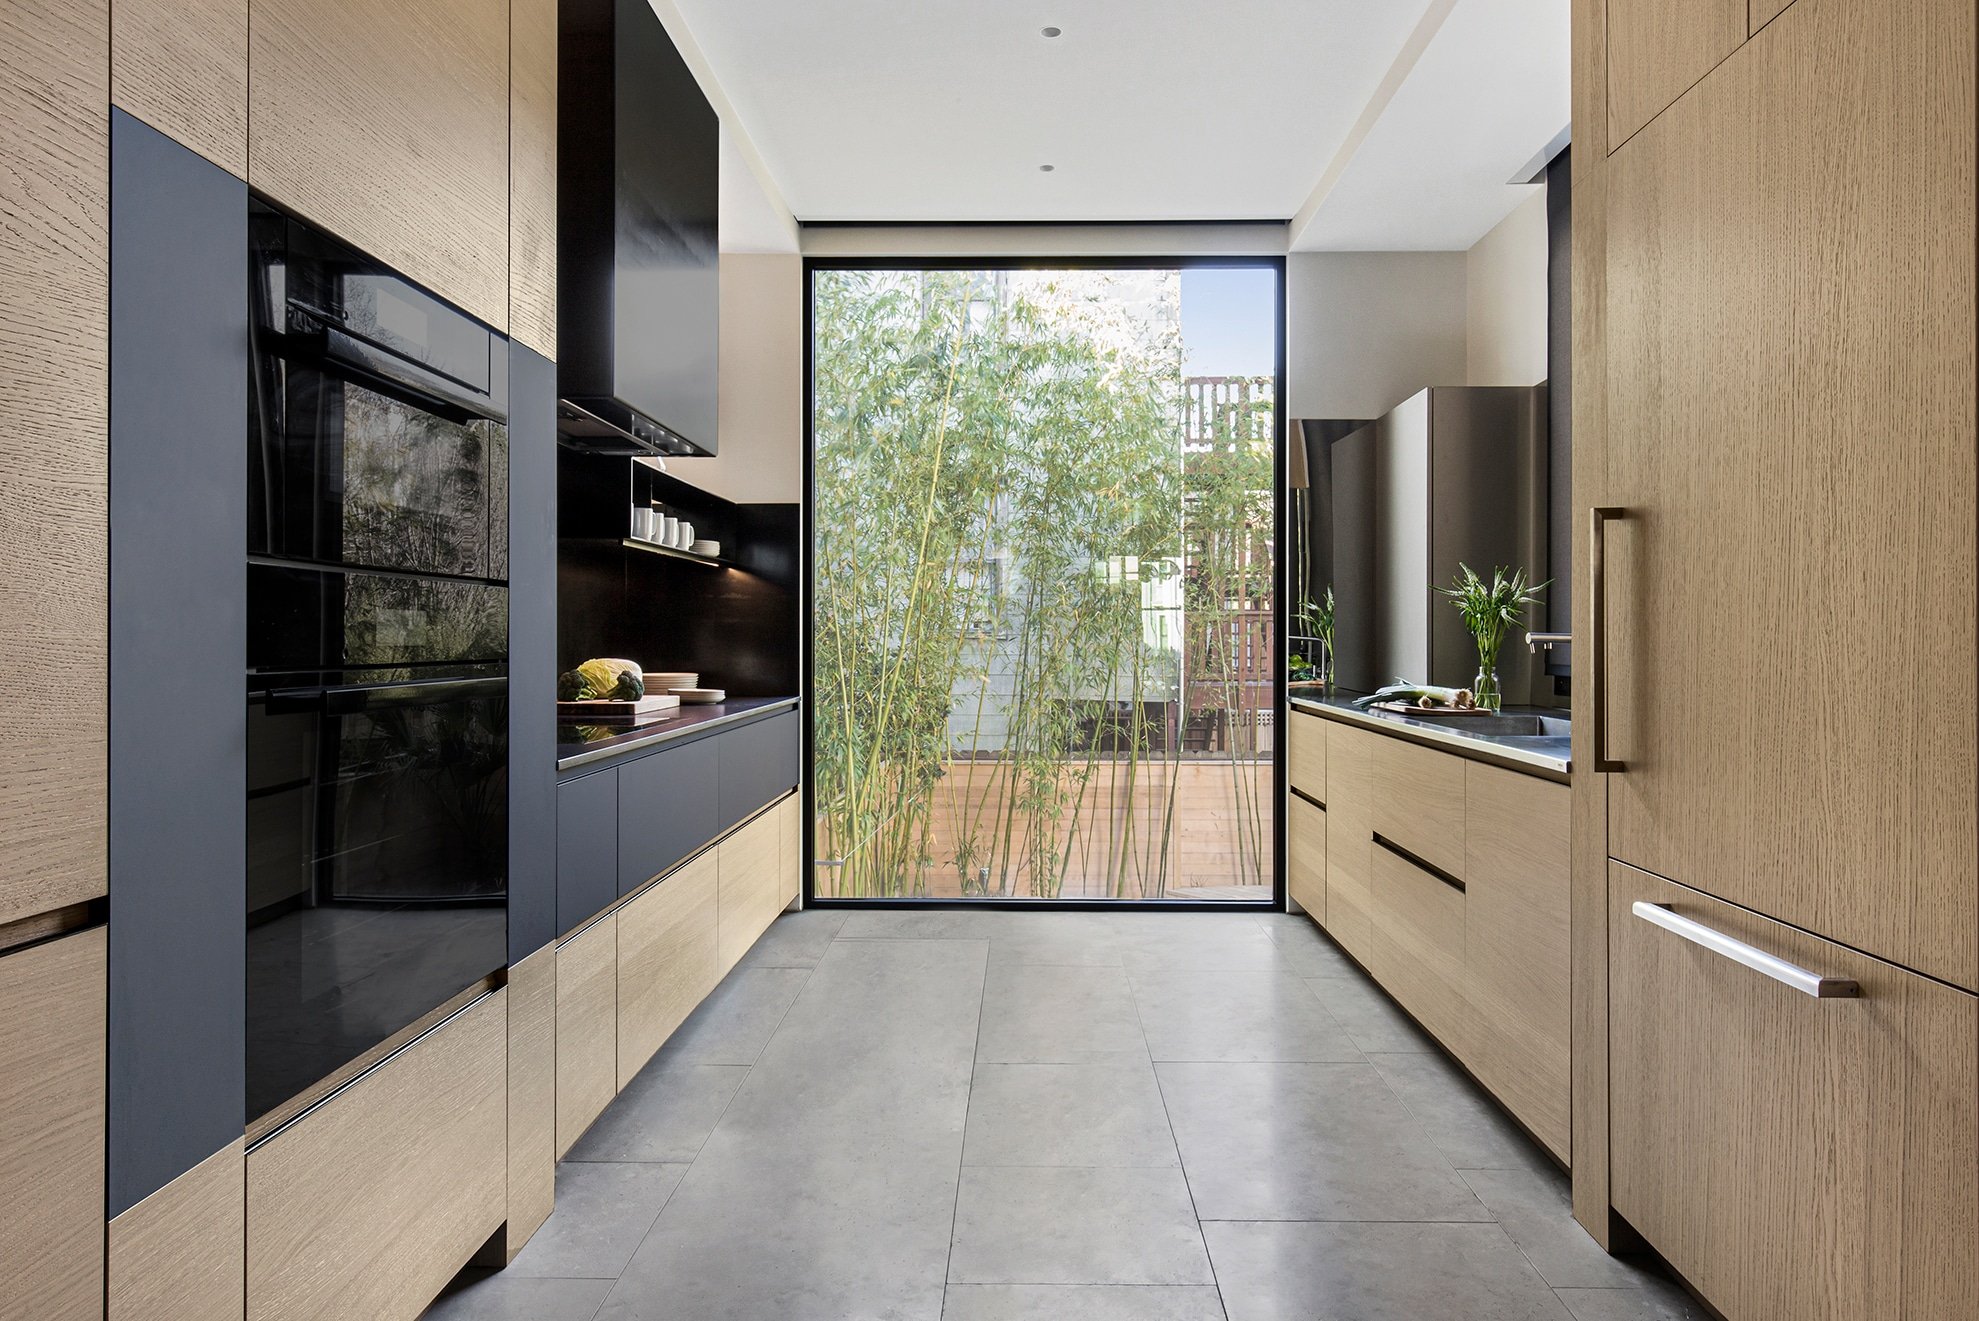 portfolio, castro district residential remodel, interior of kitchen